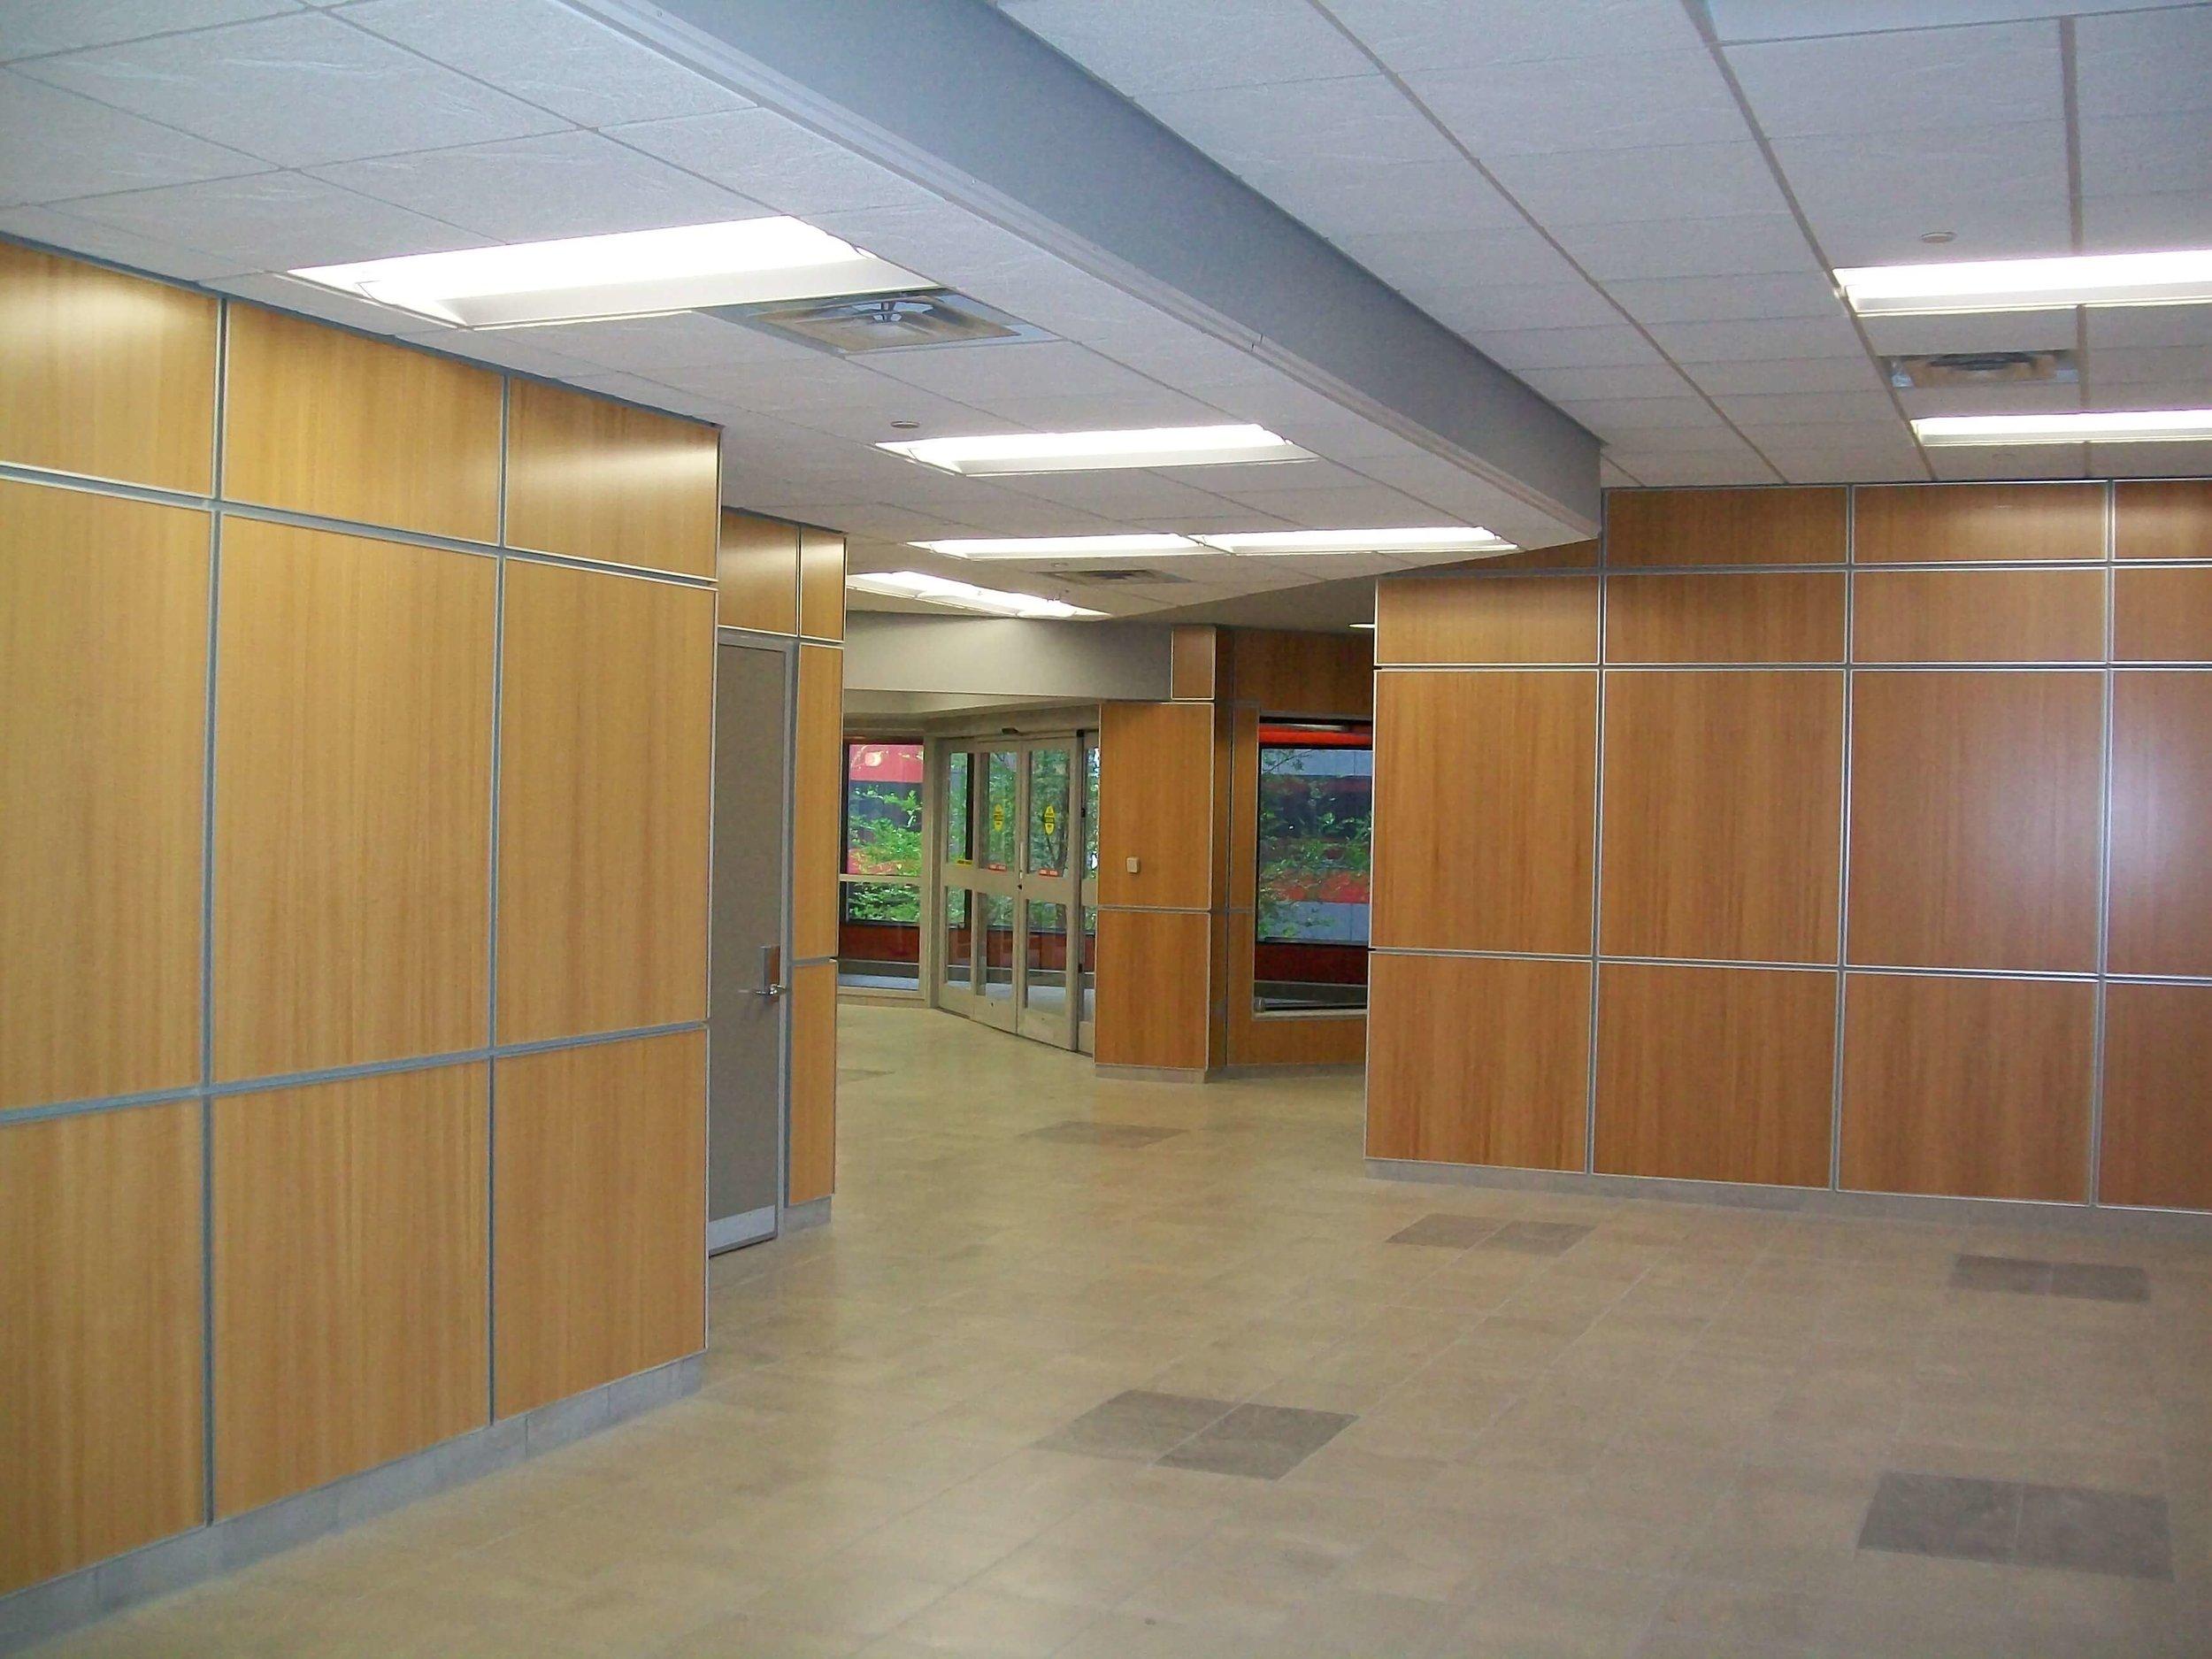 LSU Health Sciences Center - New Orleans, LA